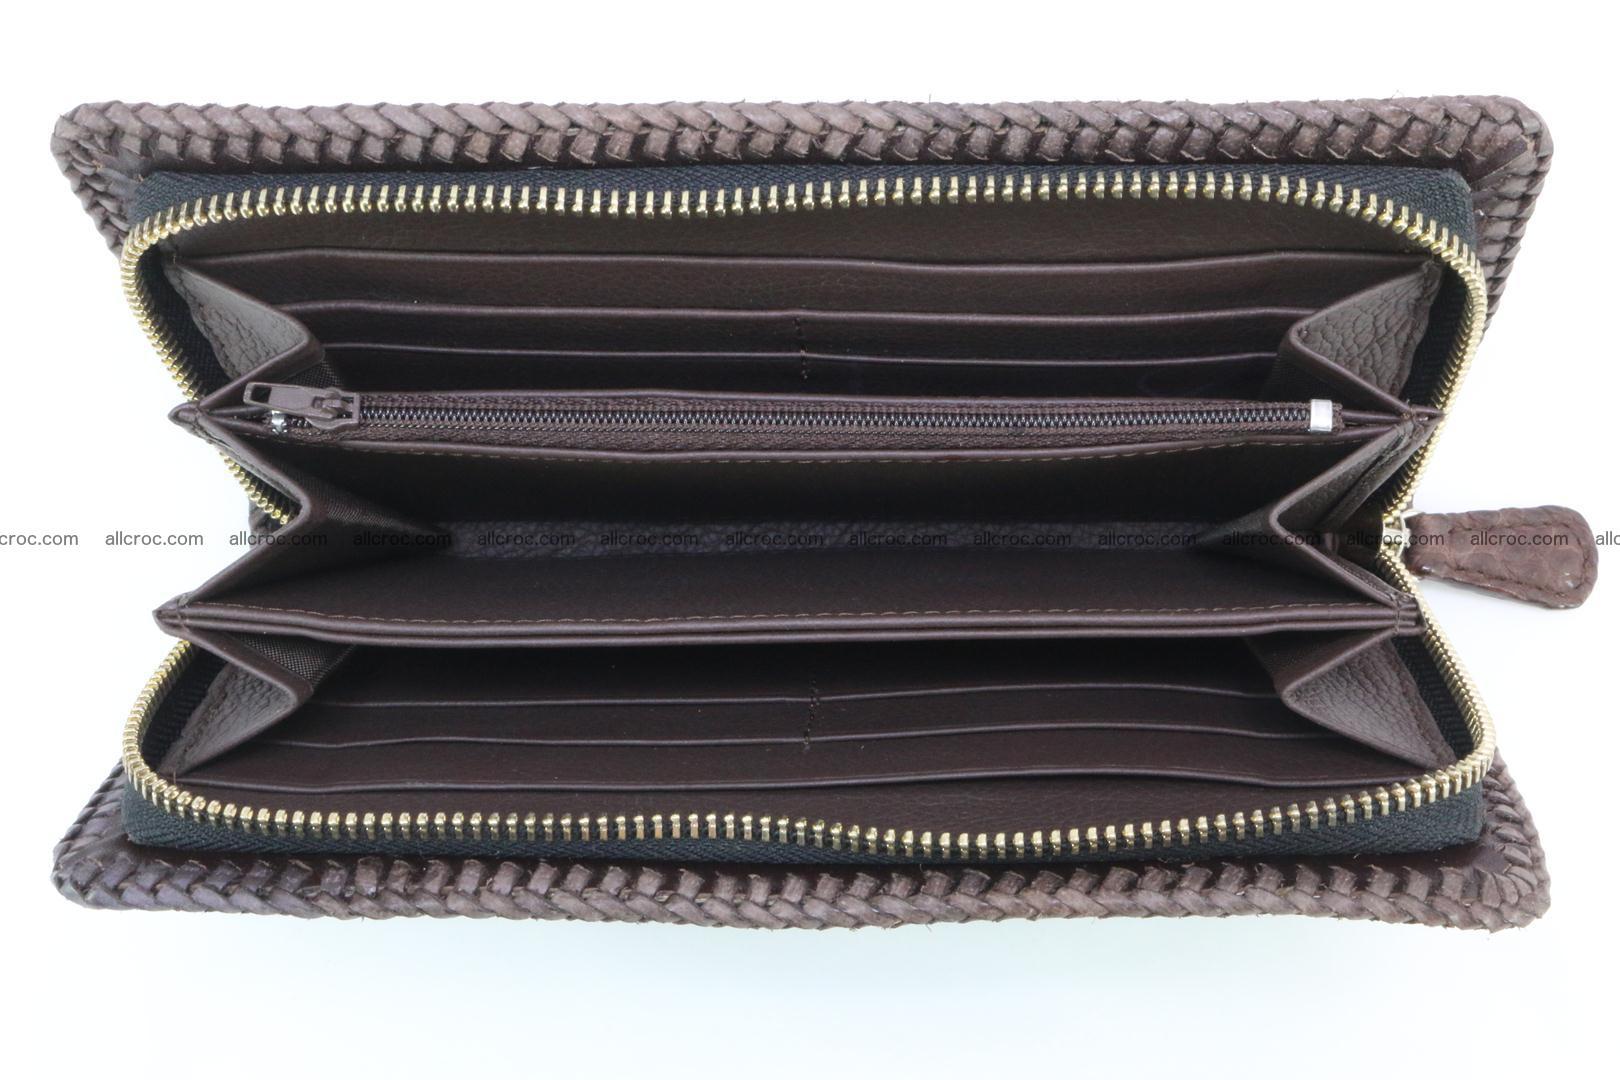 Genuine crocodile hornback wallet with zip 104 Foto 7